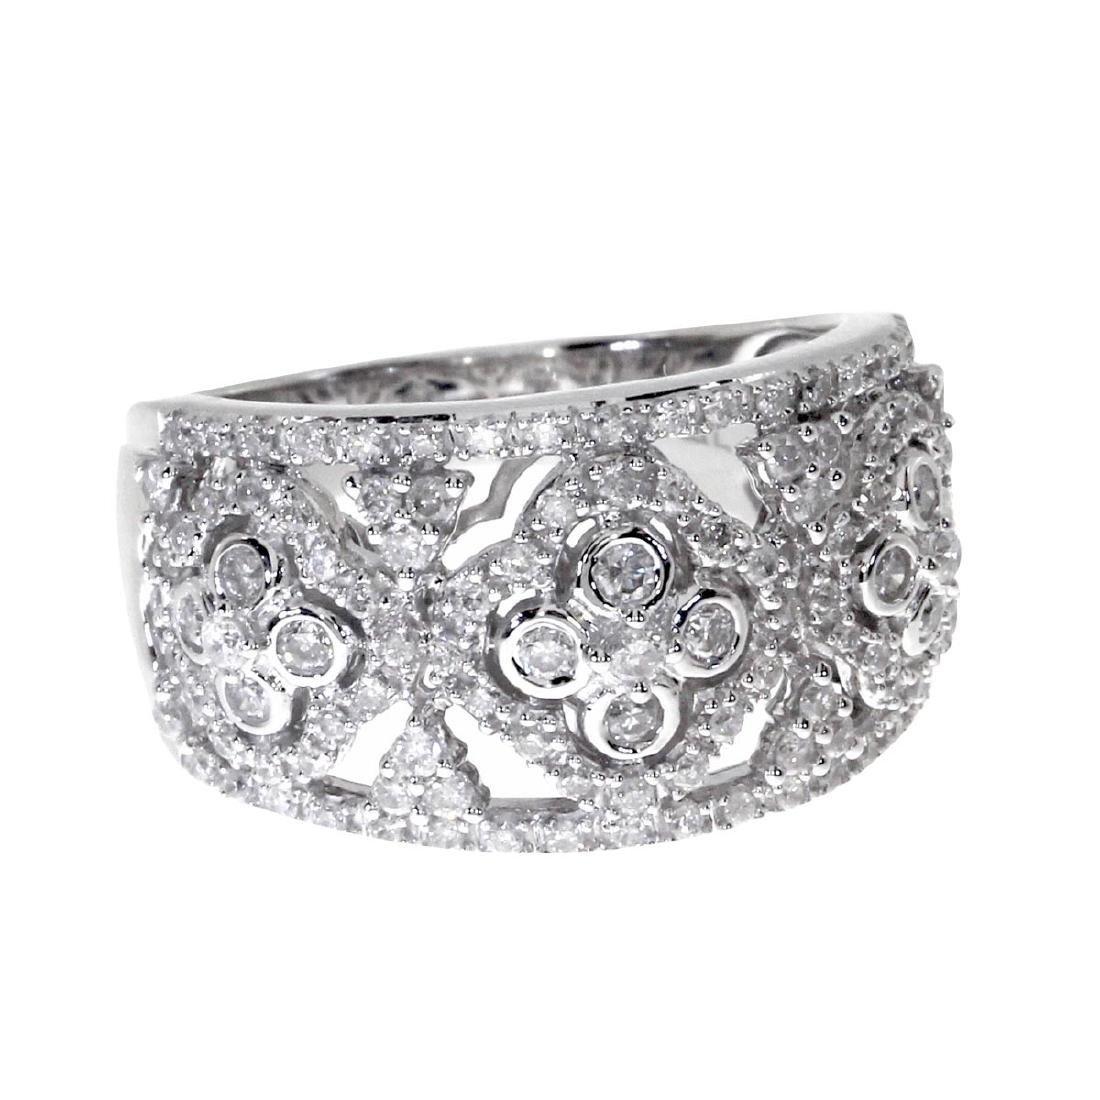 Certified 14k White Gold Diamond Clover Fashion Band 0.